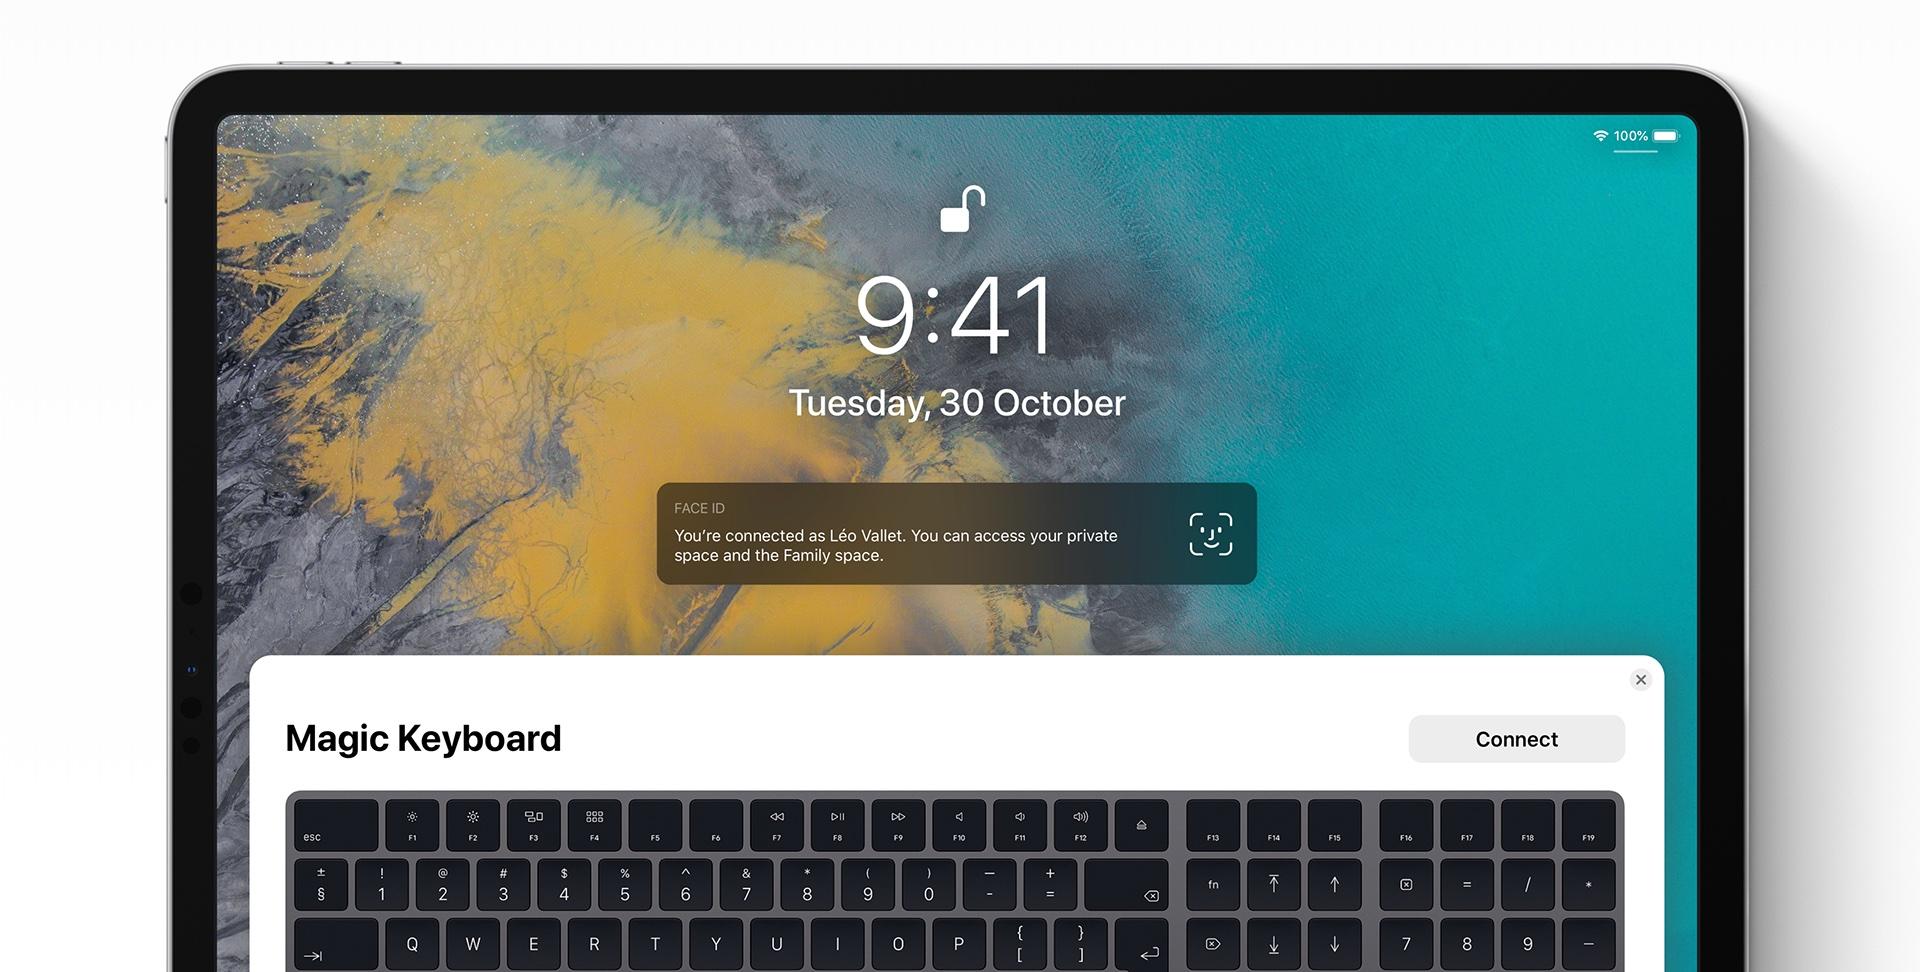 ios 13 concept leo vallet2 - iOS 13: krásny koncept ukazuje, ako by mohla vyzerať podpora Magic Mouse na iPade